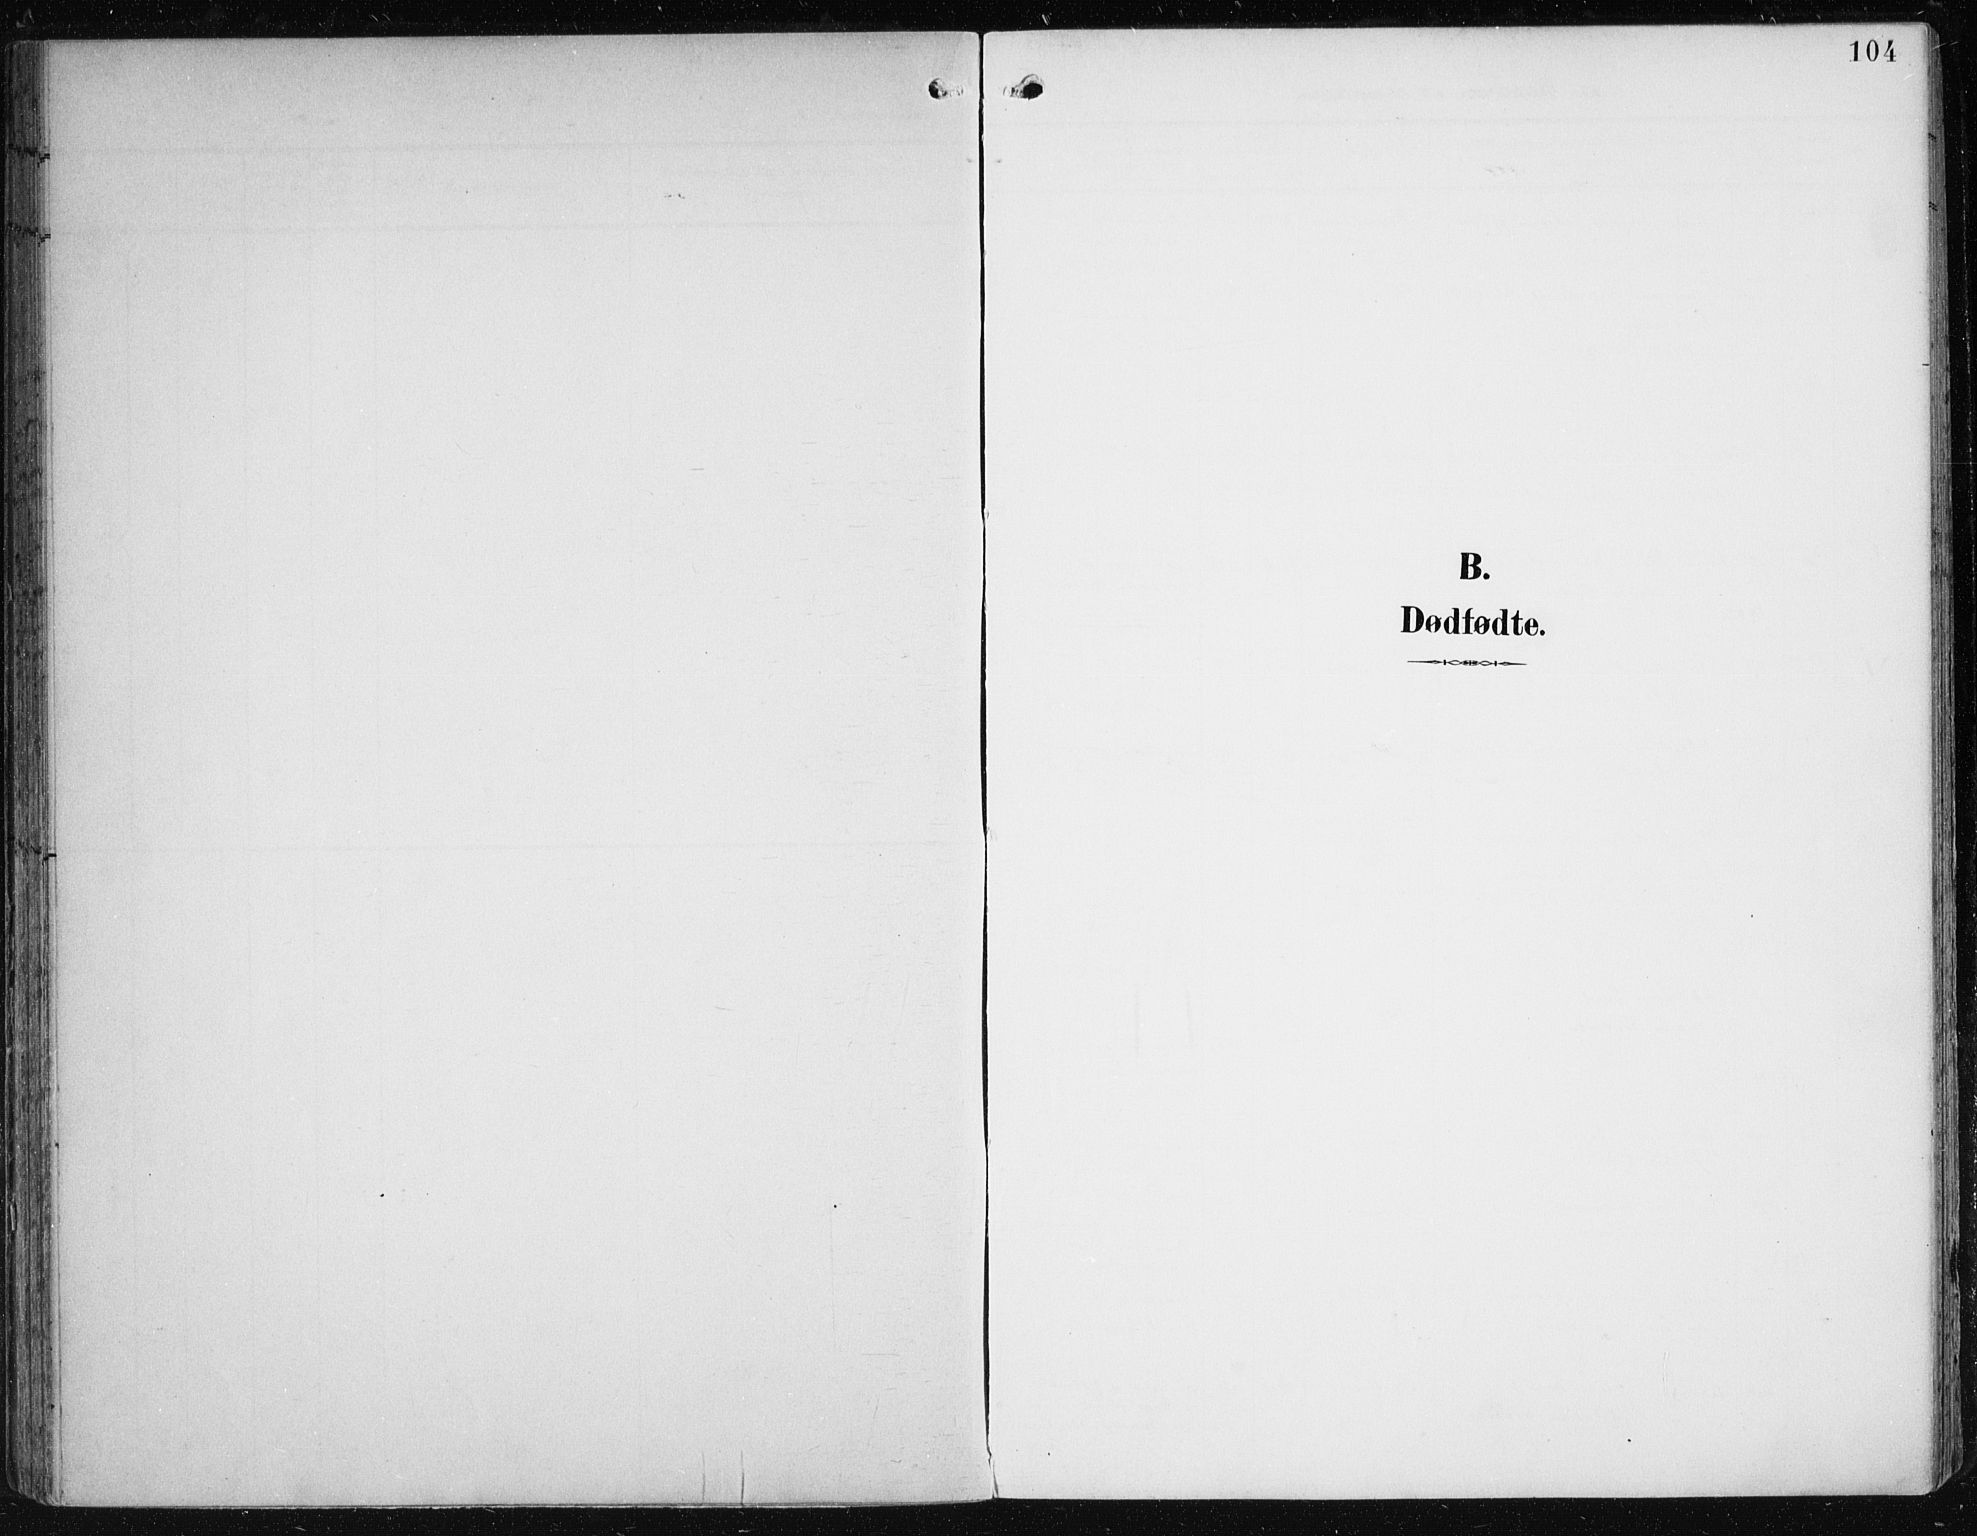 SAB, Fana Sokneprestembete, H/Haa/Haai/L0003: Parish register (official) no. I 3, 1900-1912, p. 104